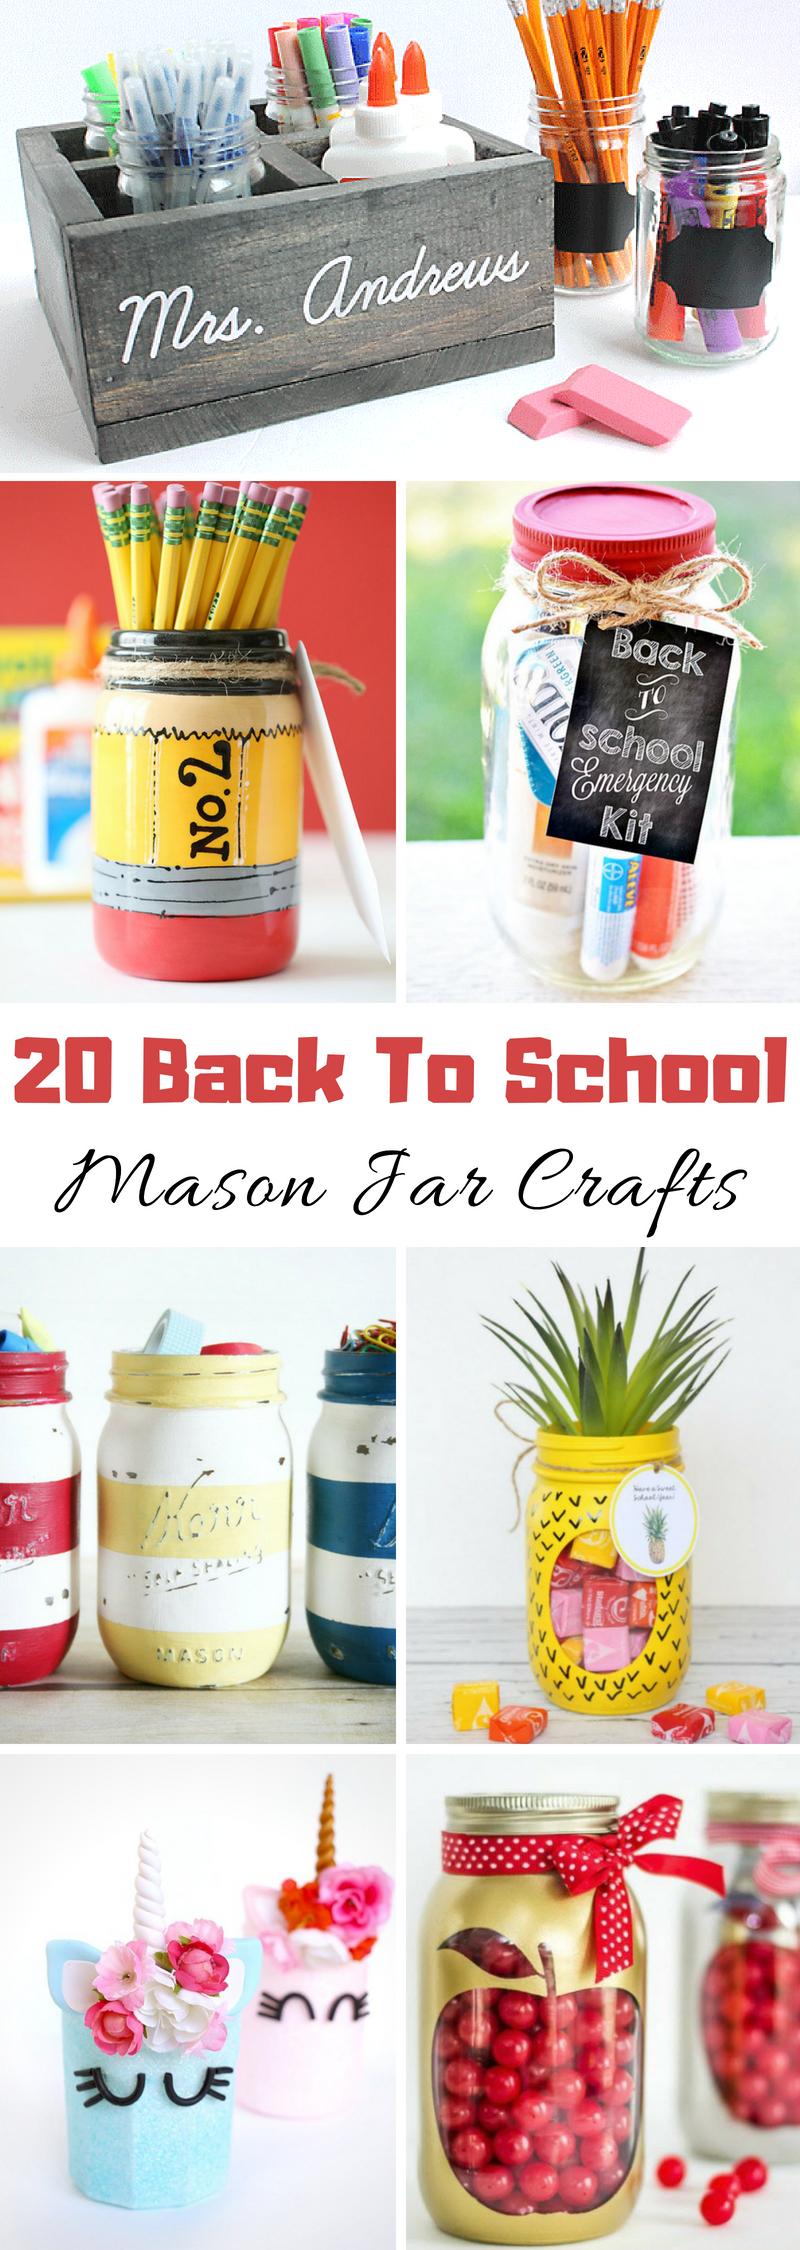 Back To School Mason Jar Crafts